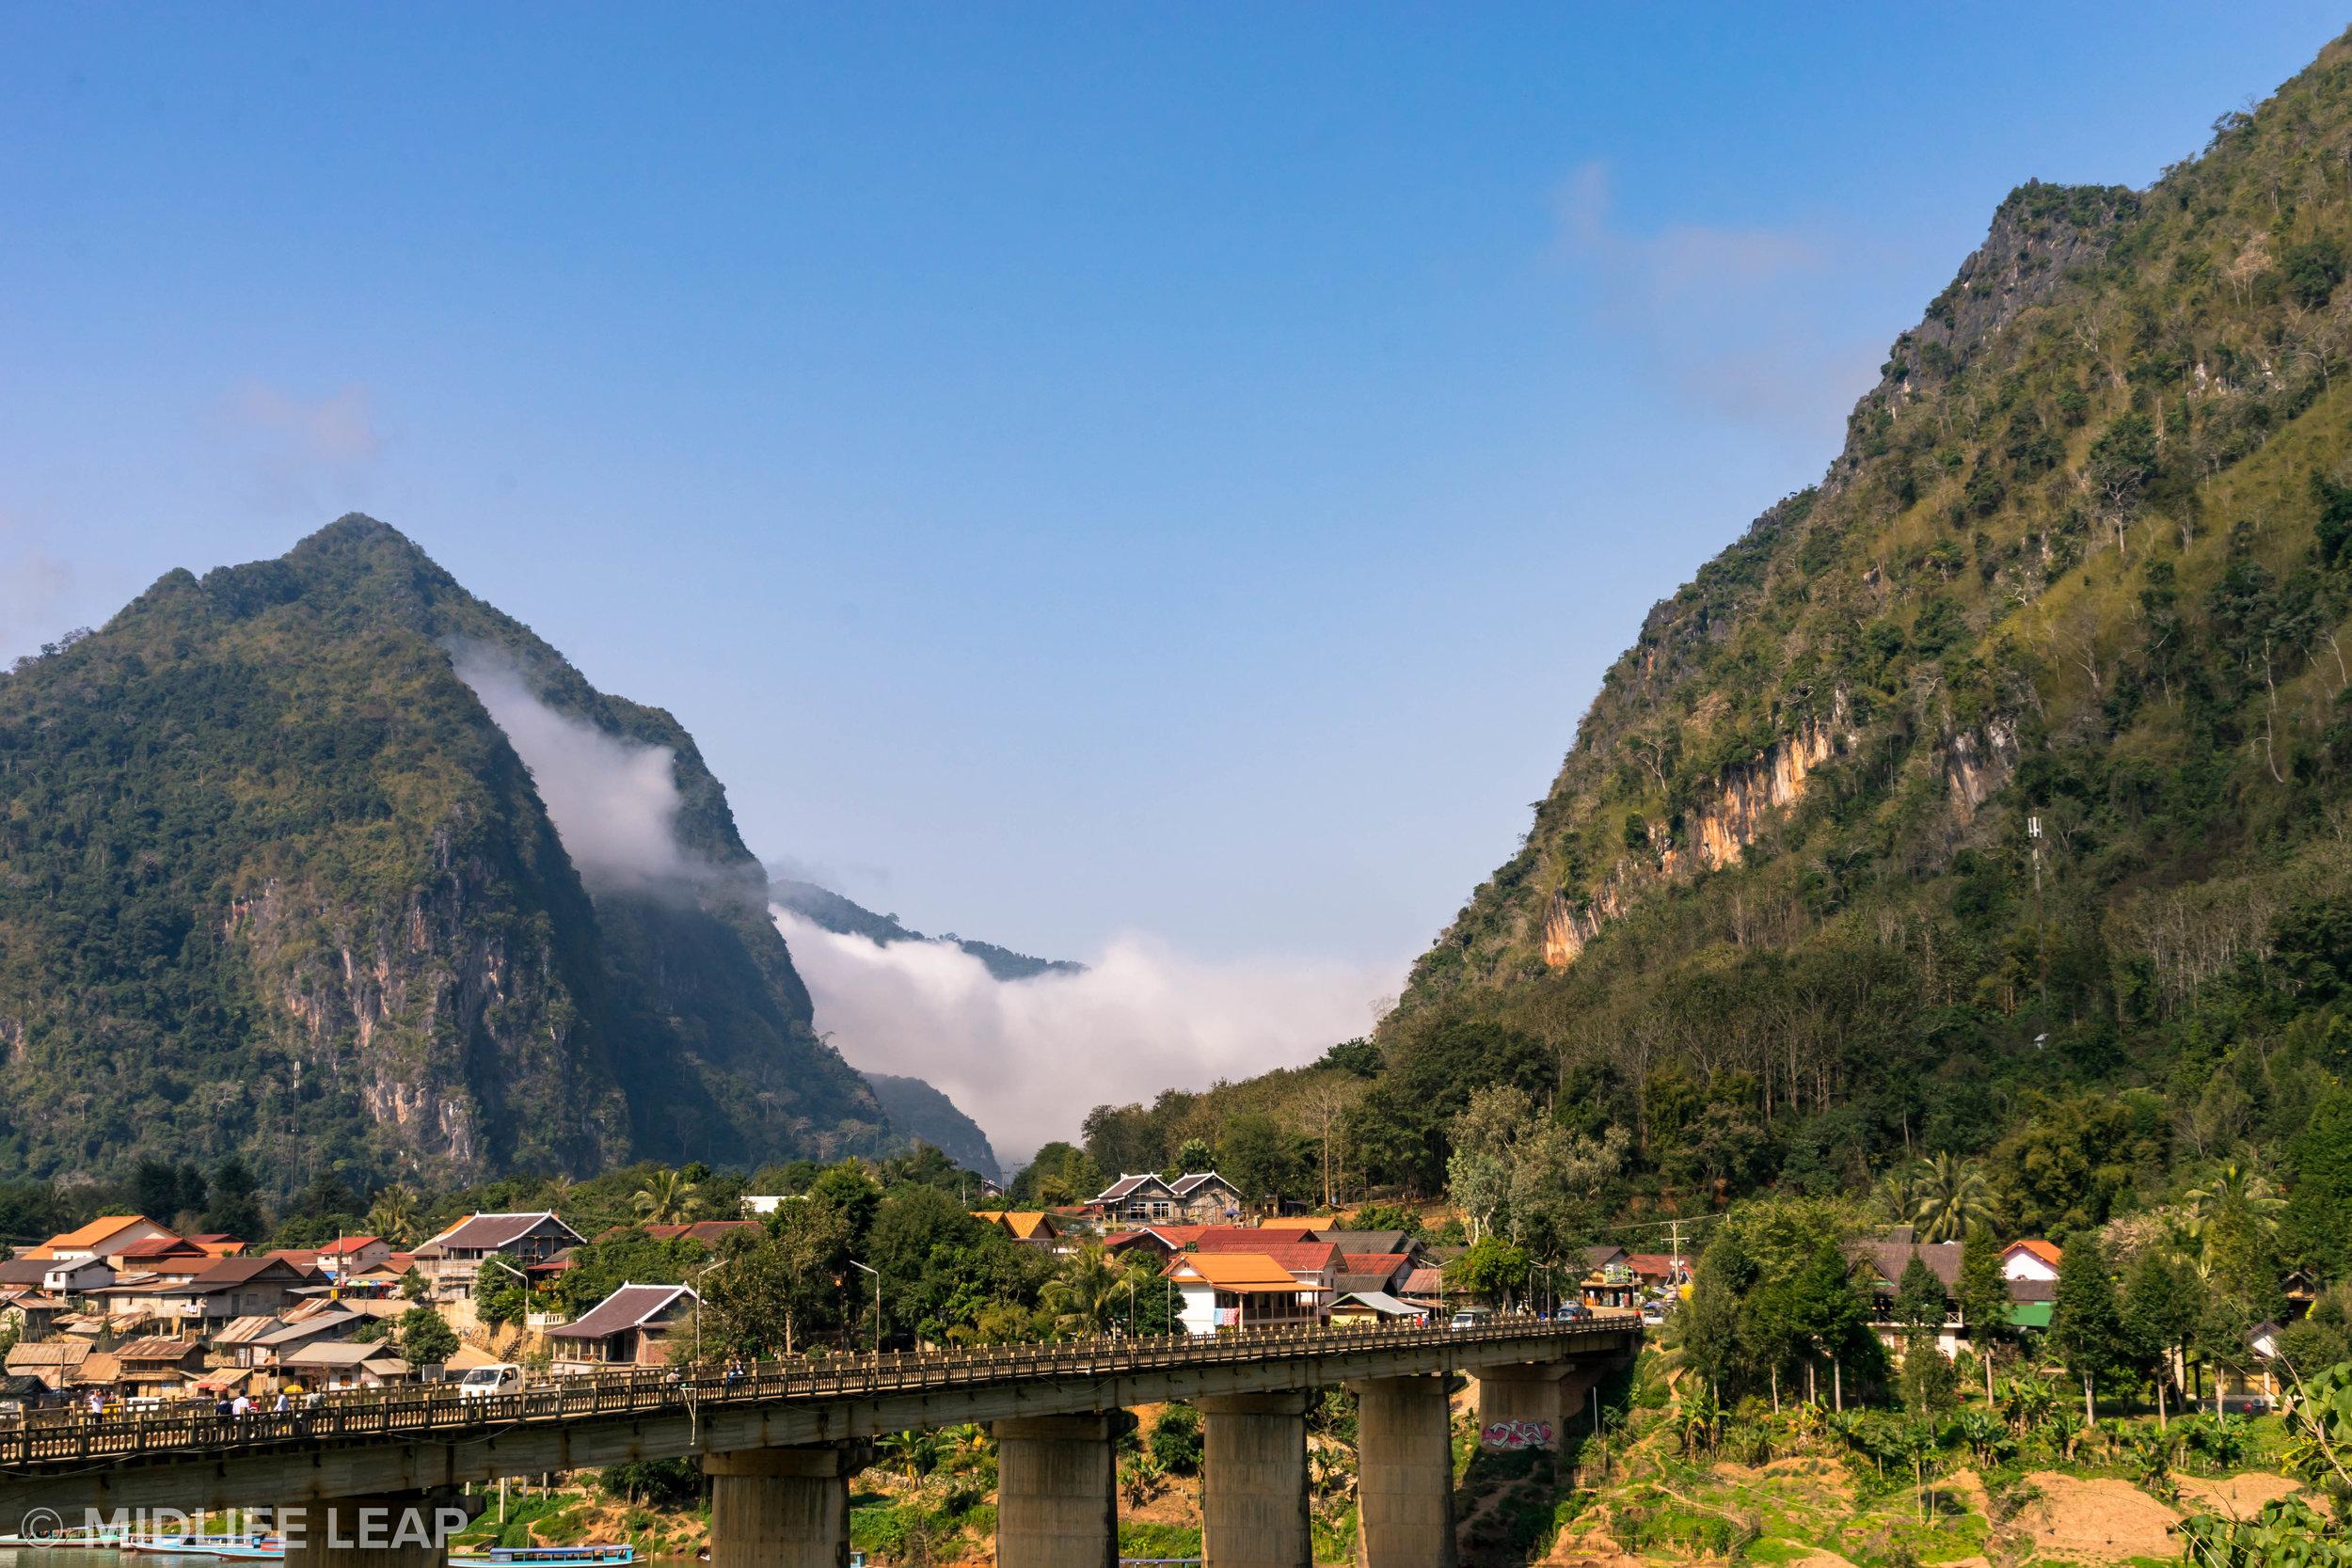 The Nong Khiaw Bridge